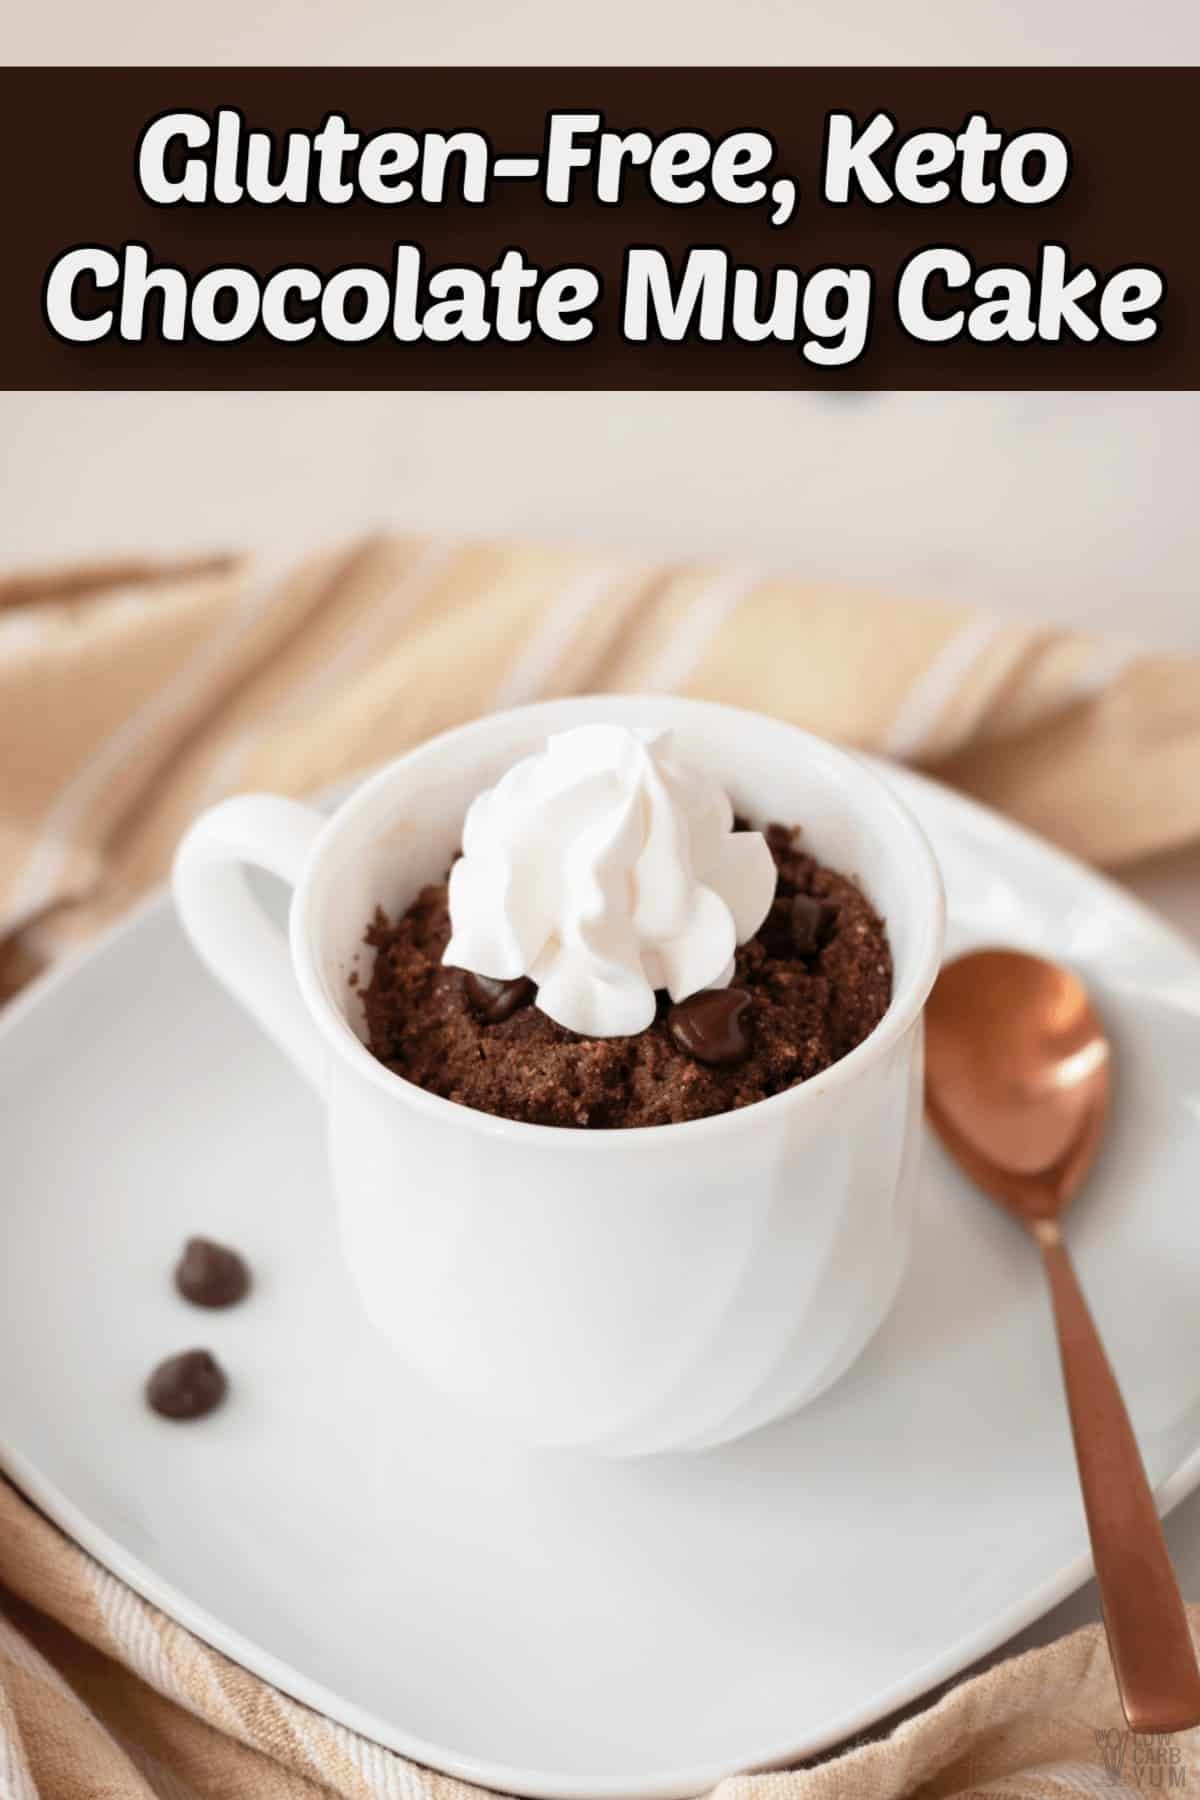 gluten free keto chocolate mug cake recipe pintrest image